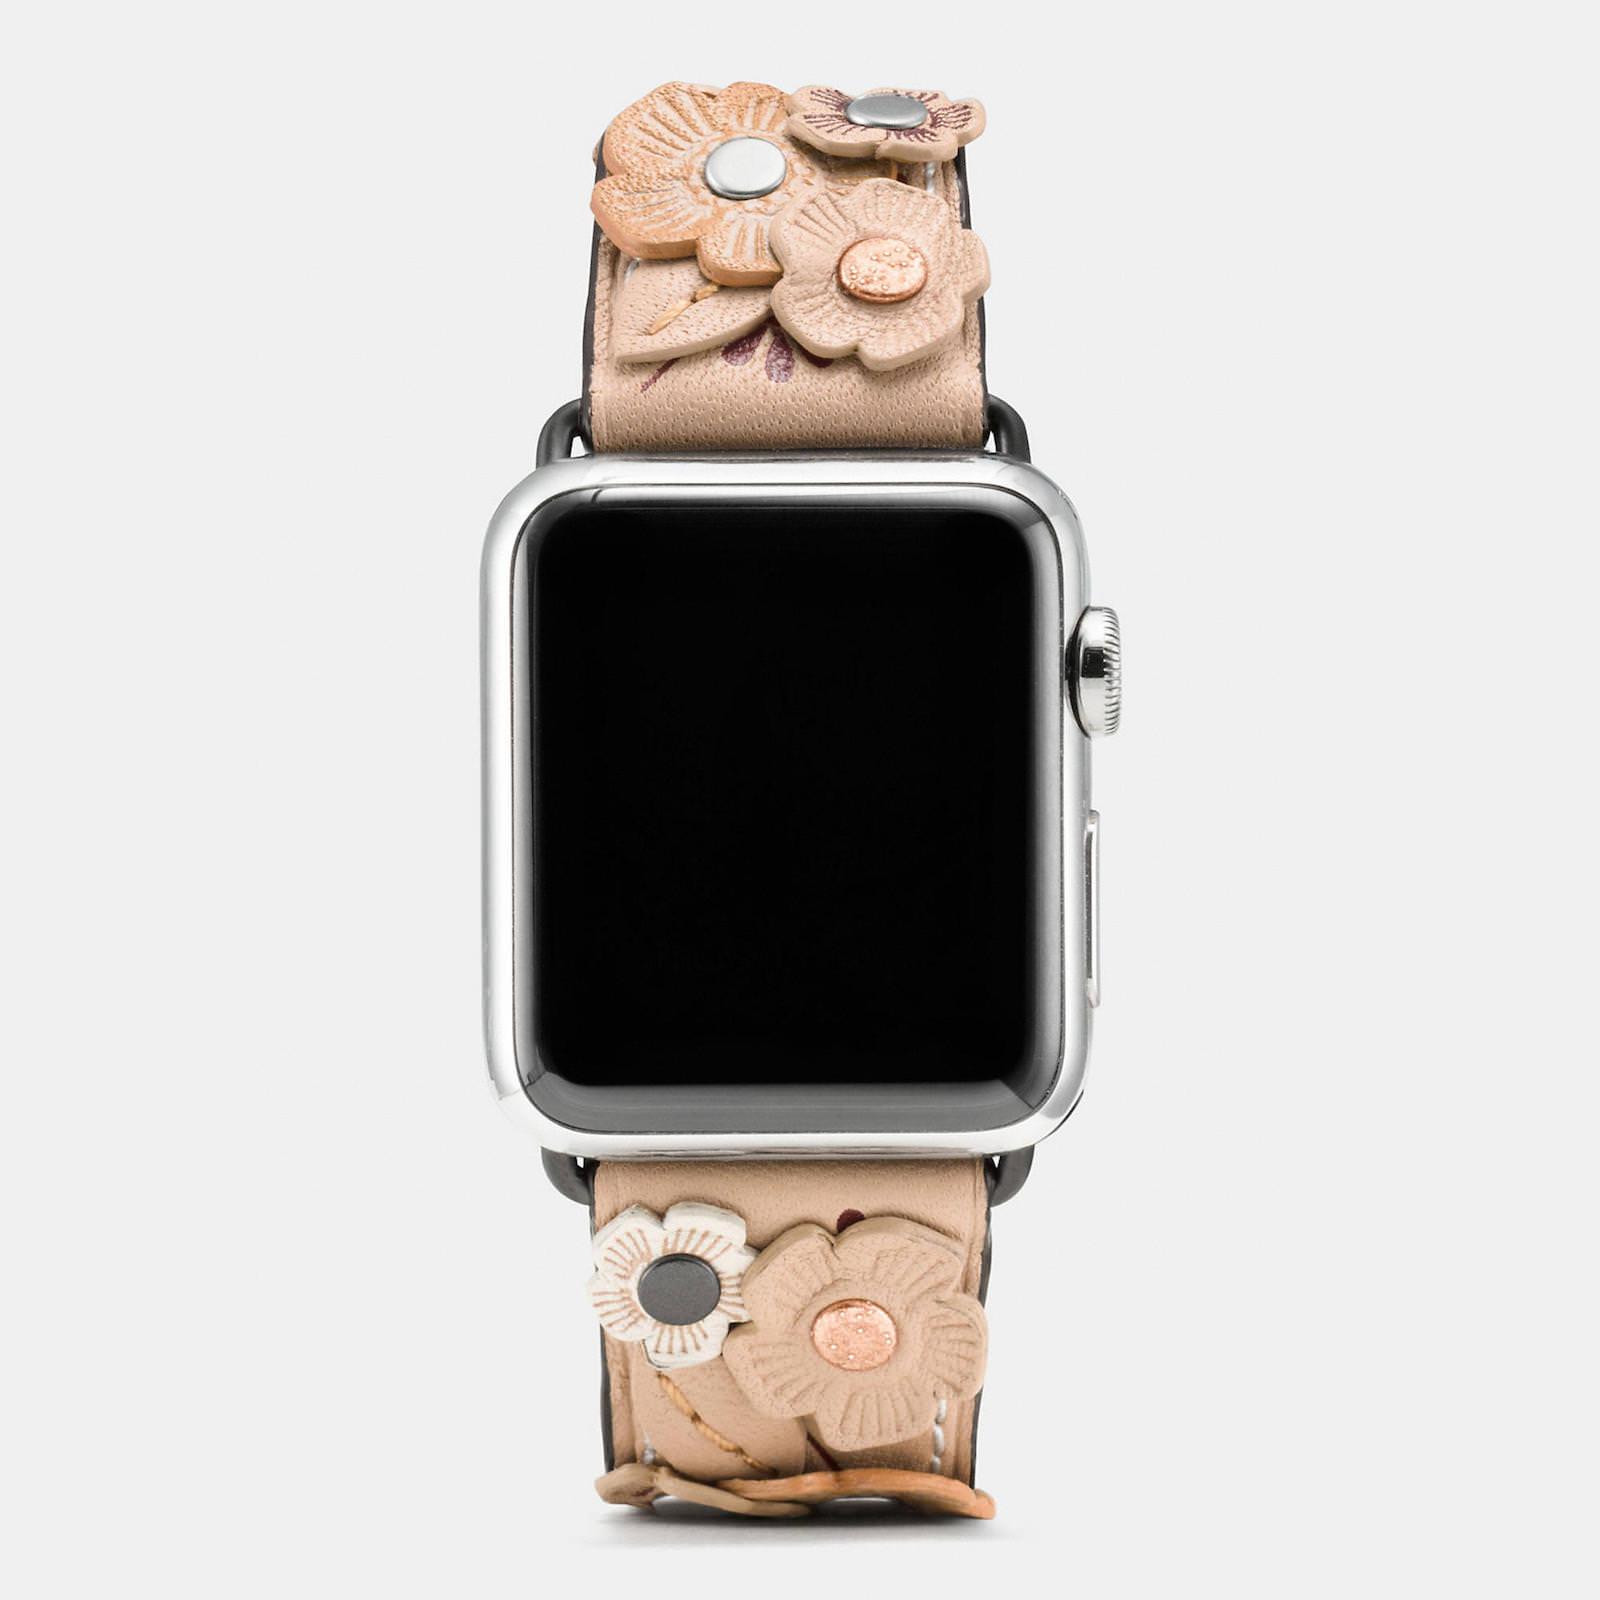 Apple-Watch-Coach-Band-Autumn-Season-10.jpeg